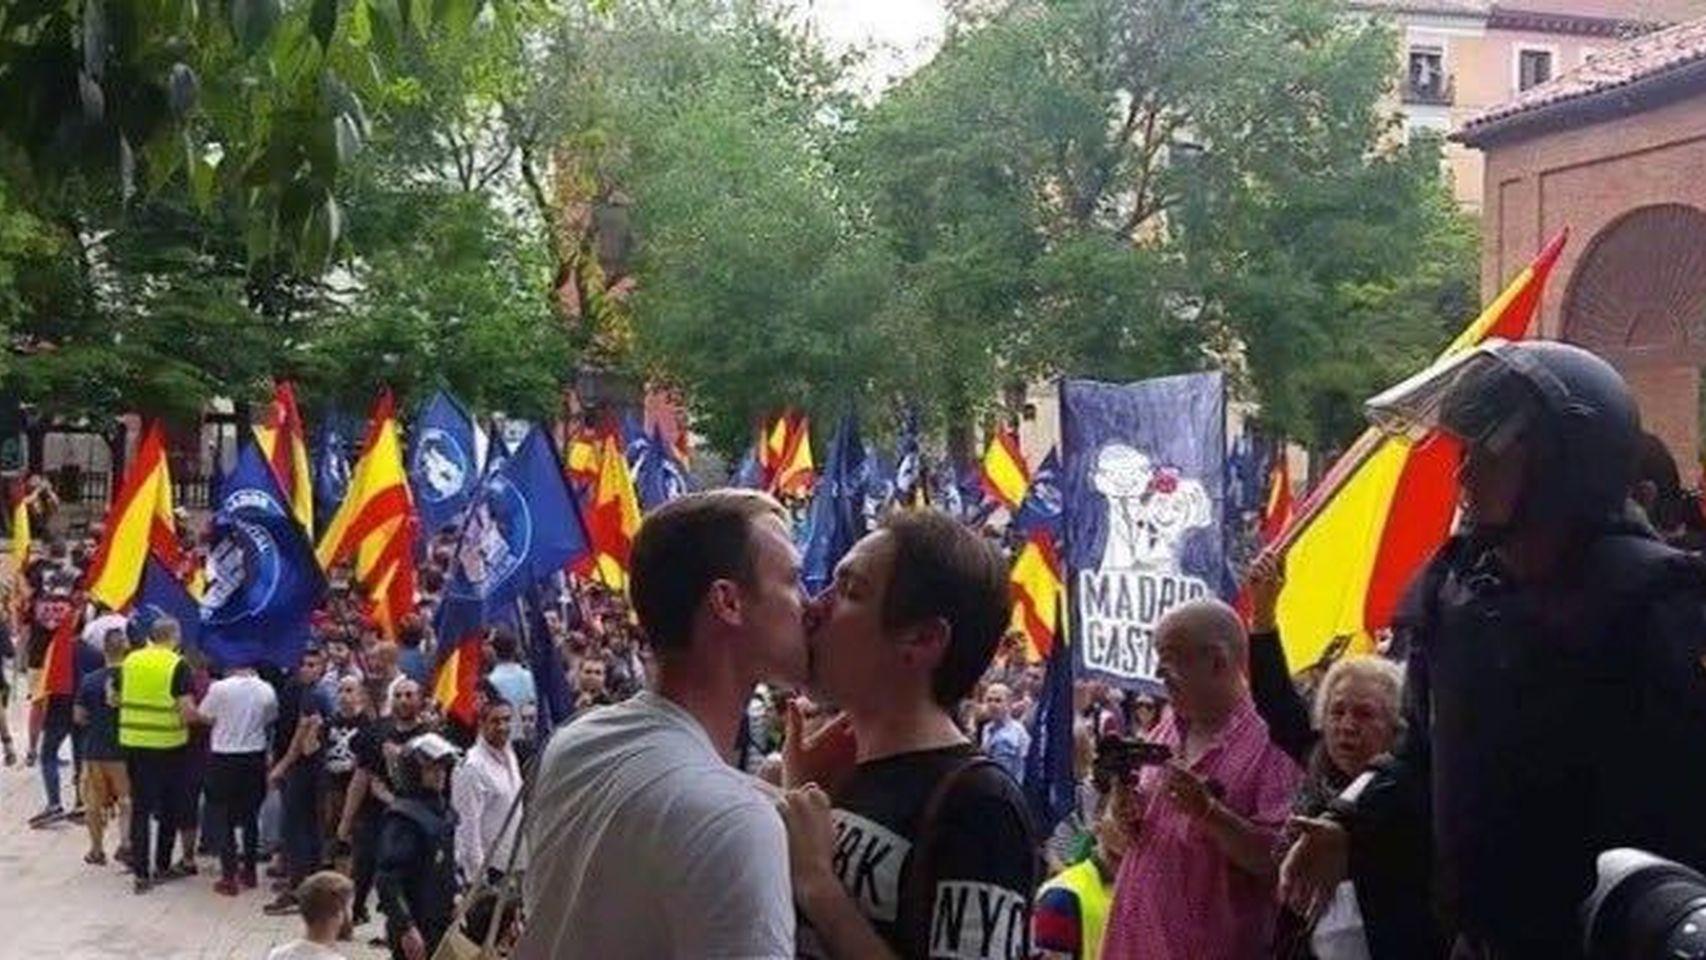 homosexuales-besan-centenares-manifestantes-utltraderecha_126748178_5264979_1706x960